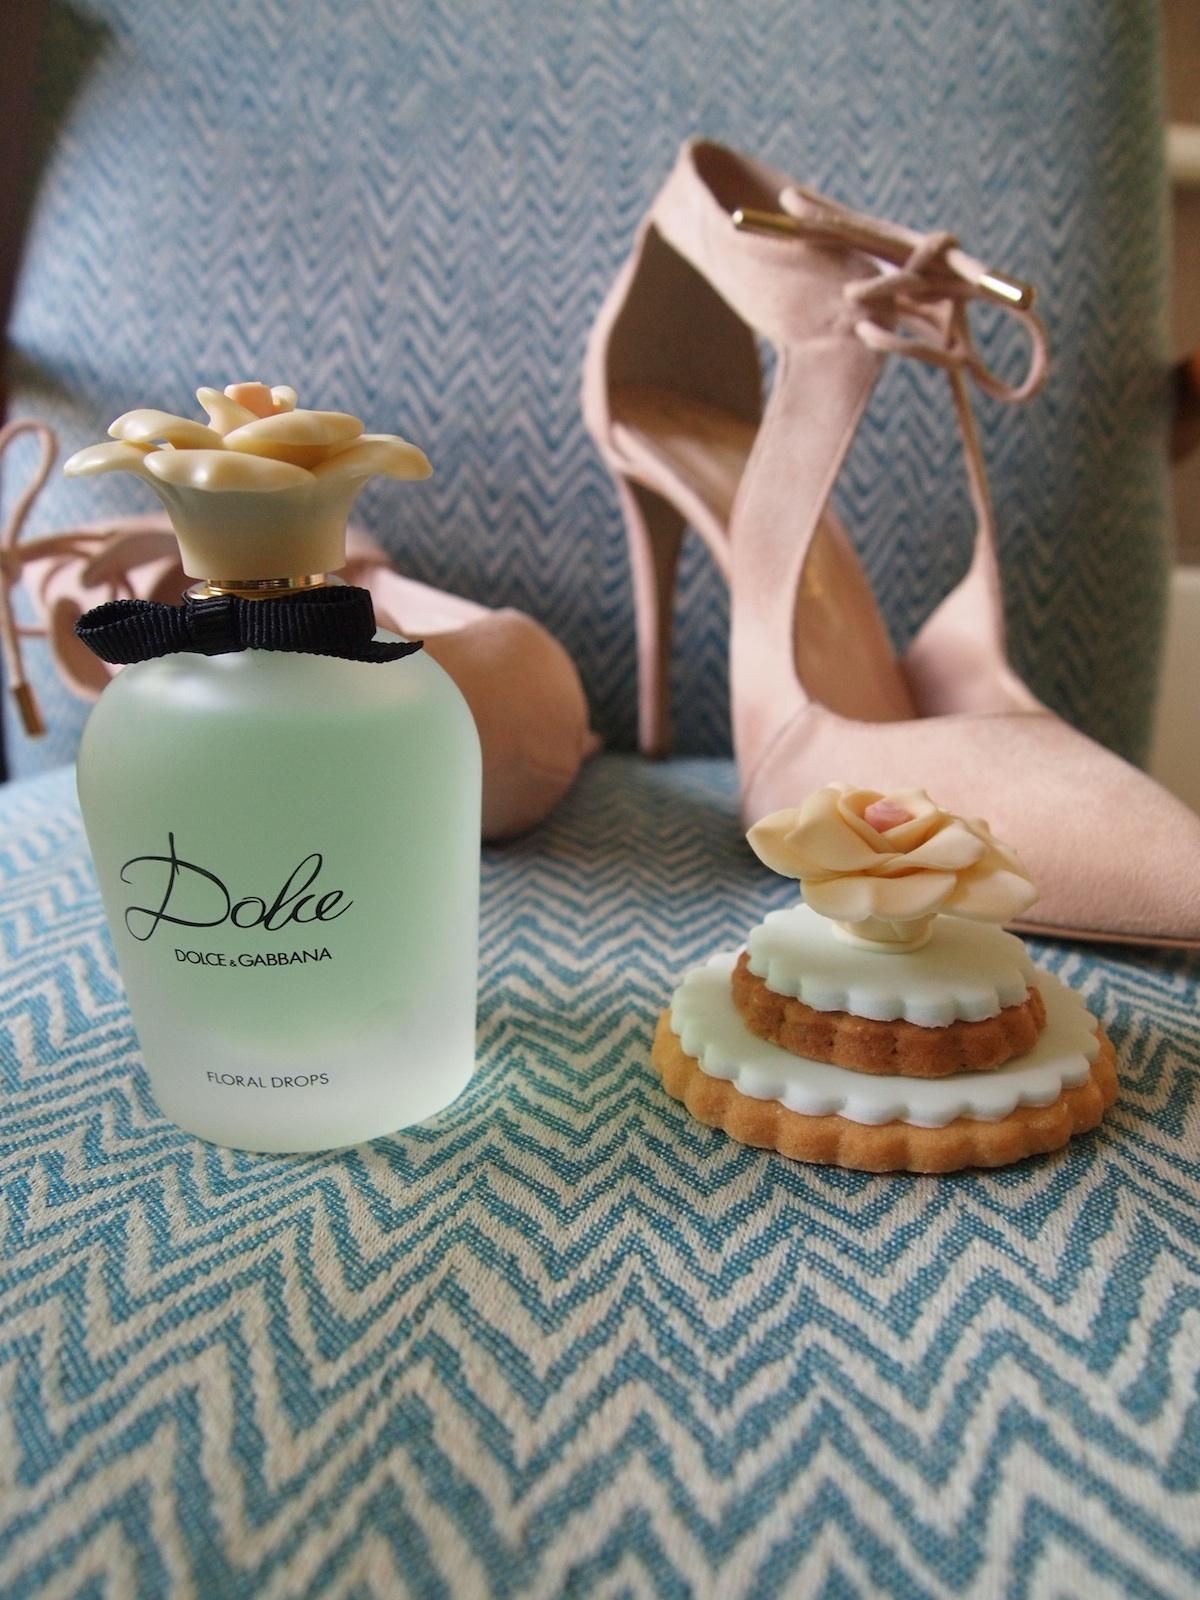 ysmf.dolce.parfum.dolce.gabbana